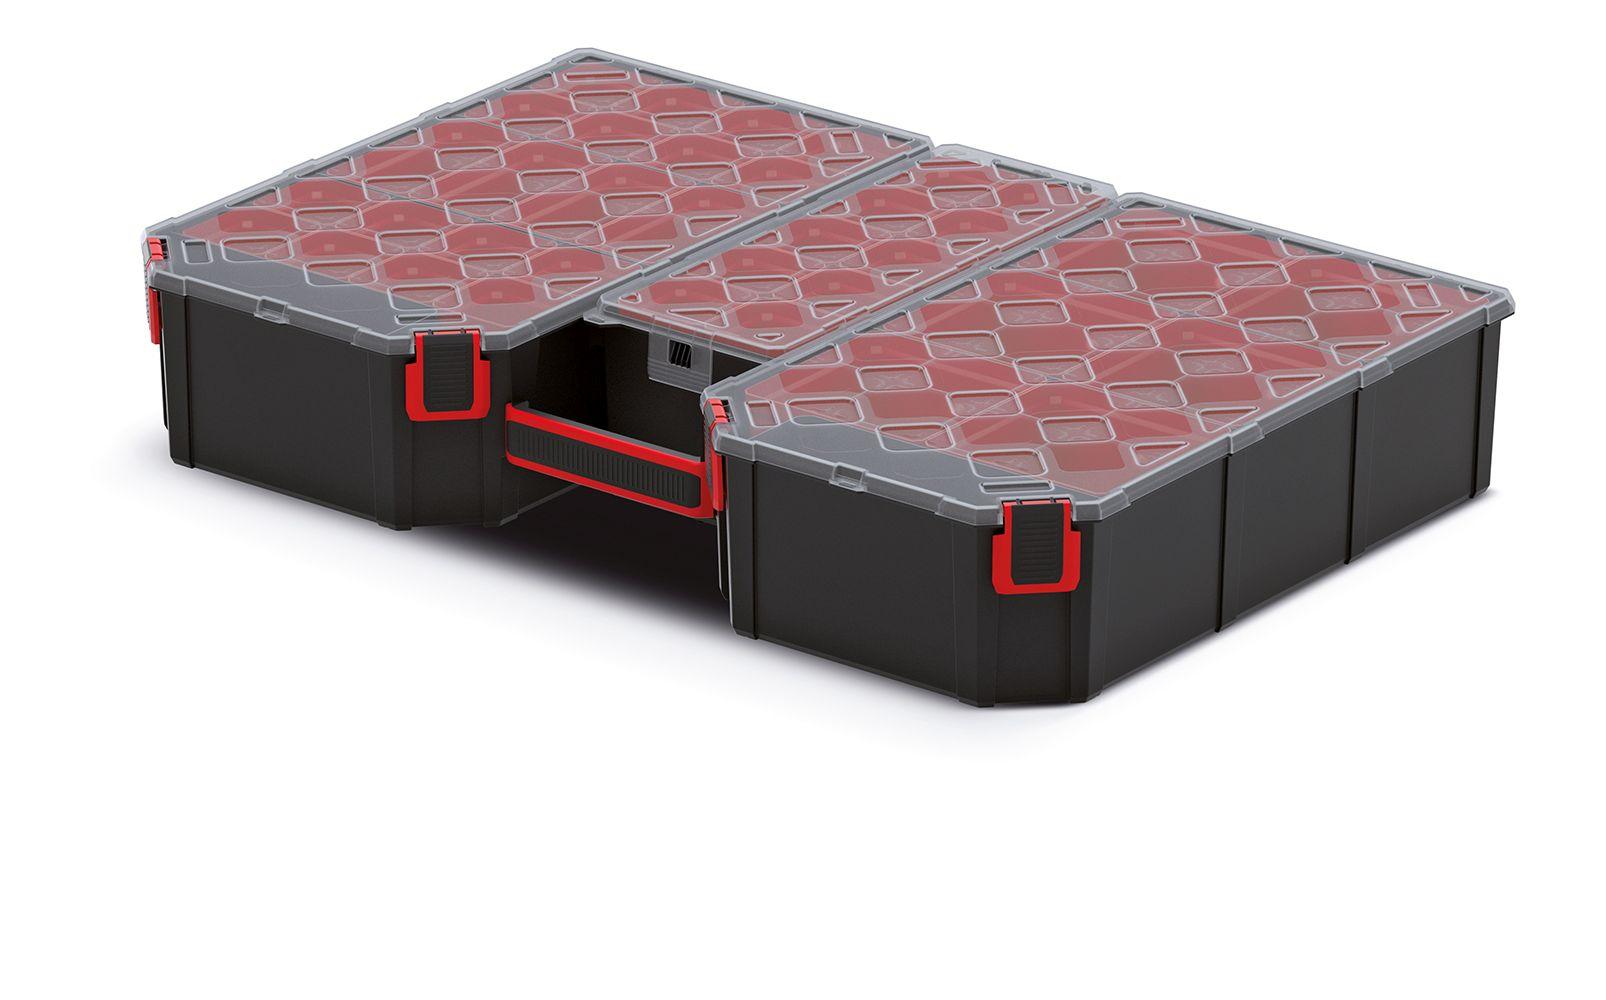 PROSPERPLAST Organizér vysoký TAGER 577x390x105 (krabičky)